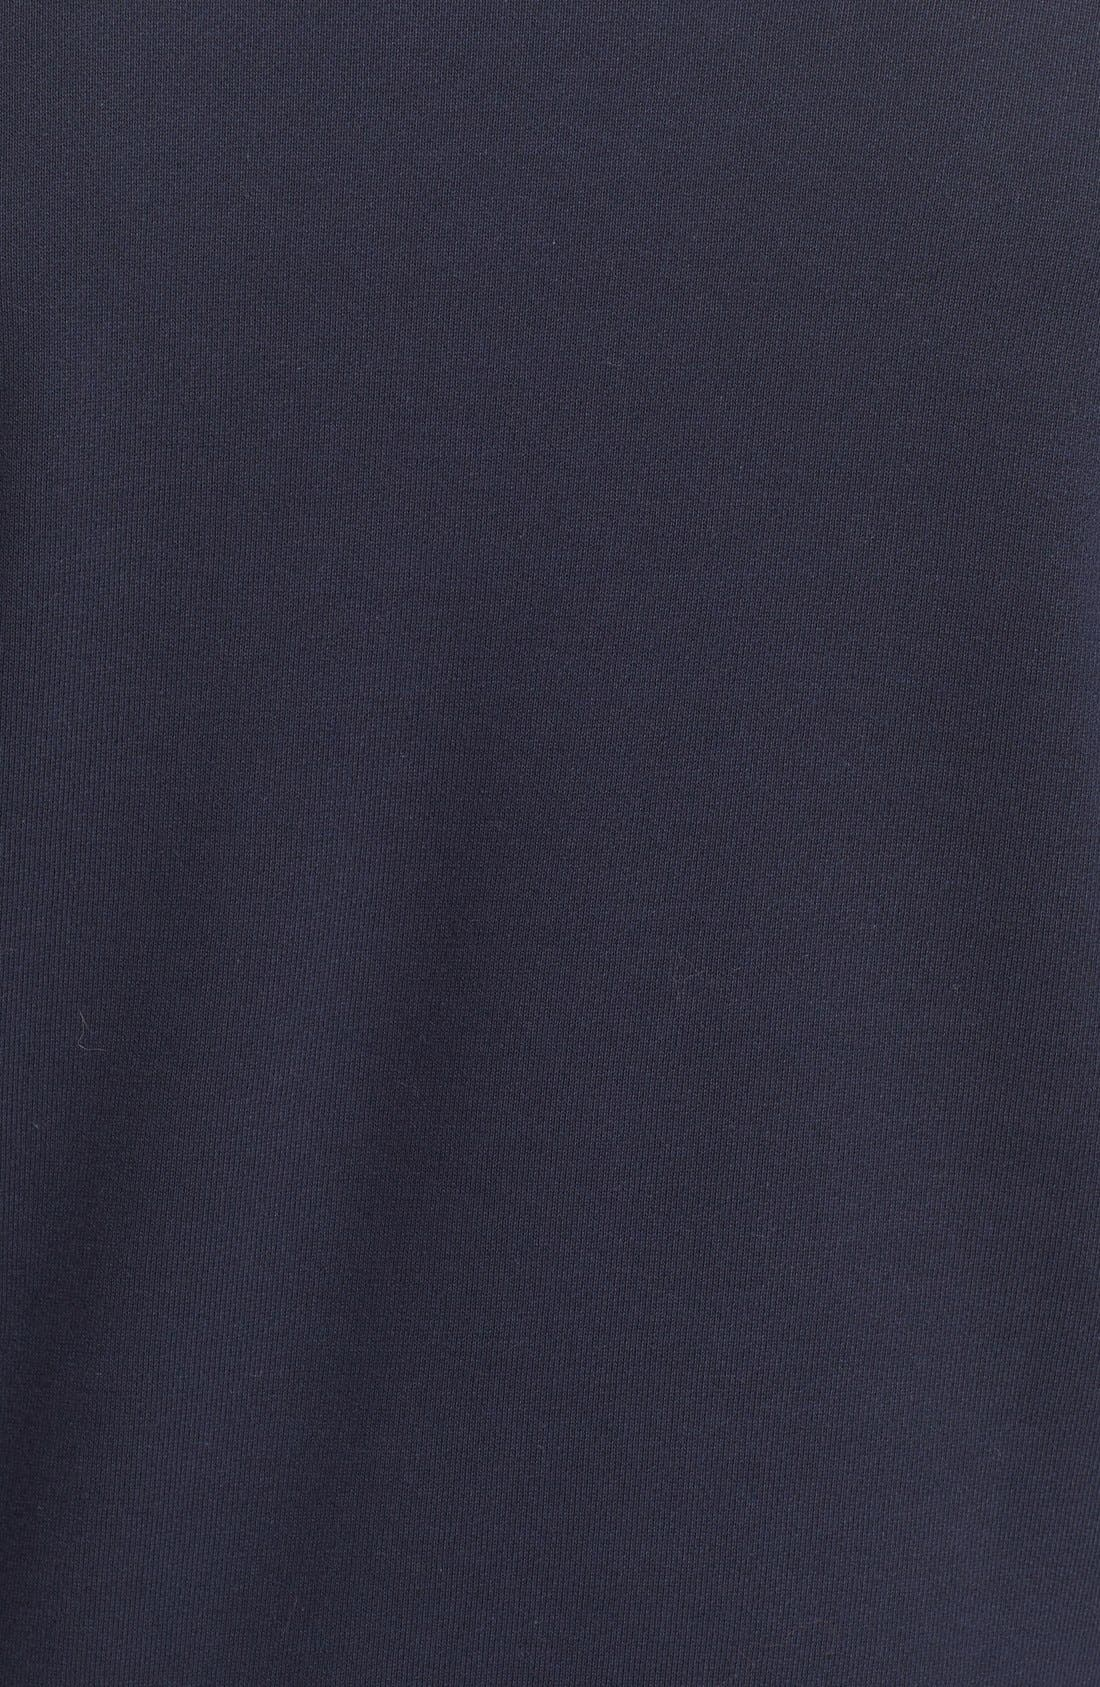 Stripe Sleeve Sweatshirt,                             Alternate thumbnail 5, color,                             Navy/ Optic White